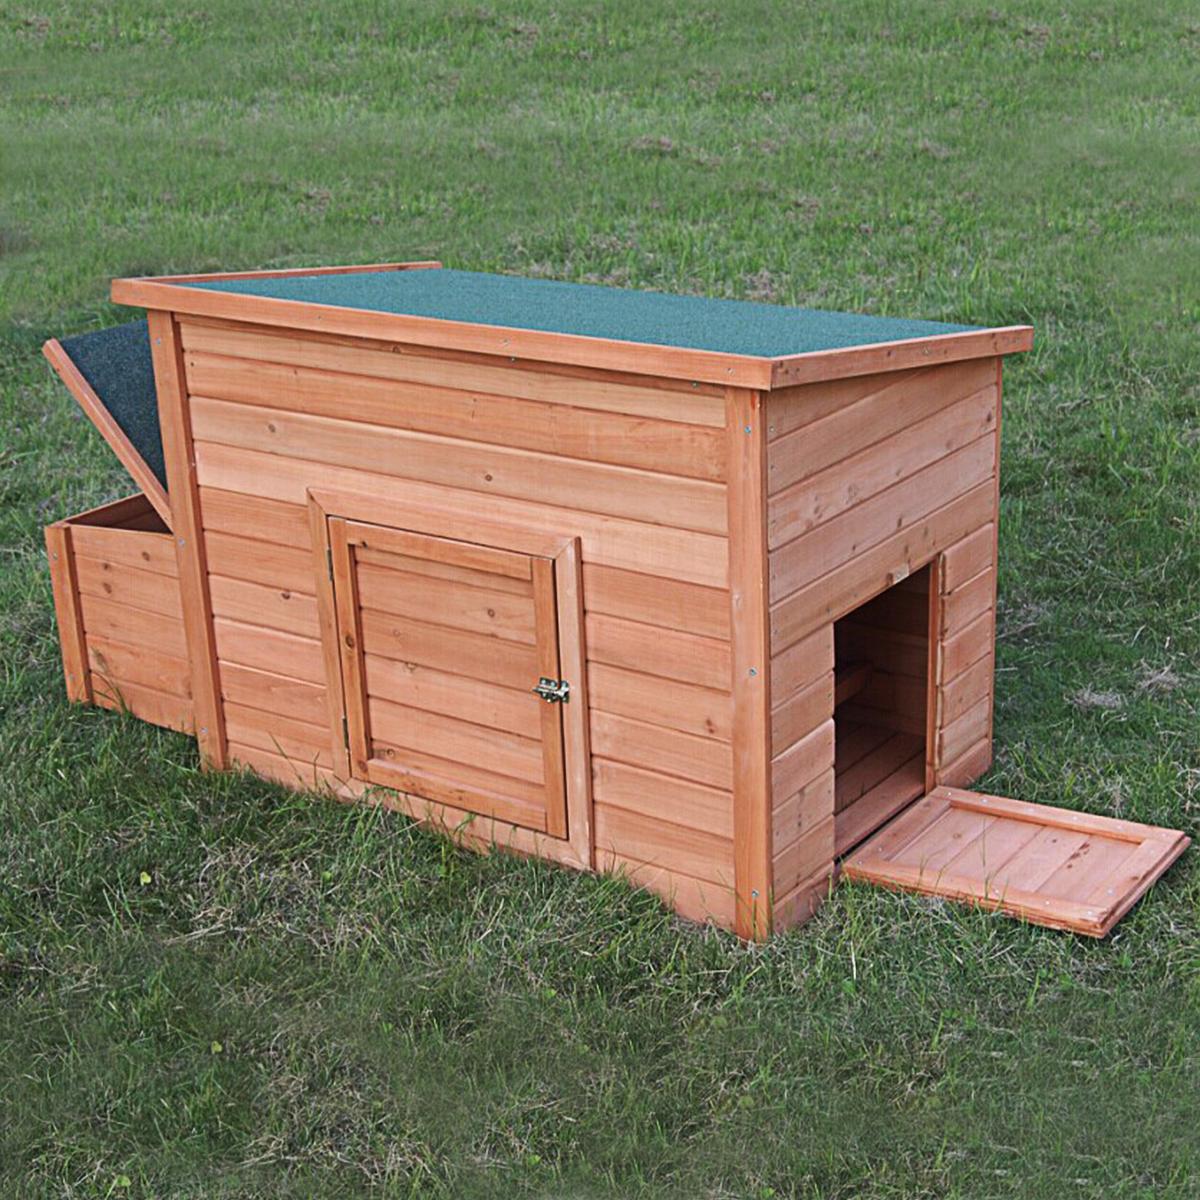 for undefined public johannesburg chicken e details sale rabbit hutch hutches coops